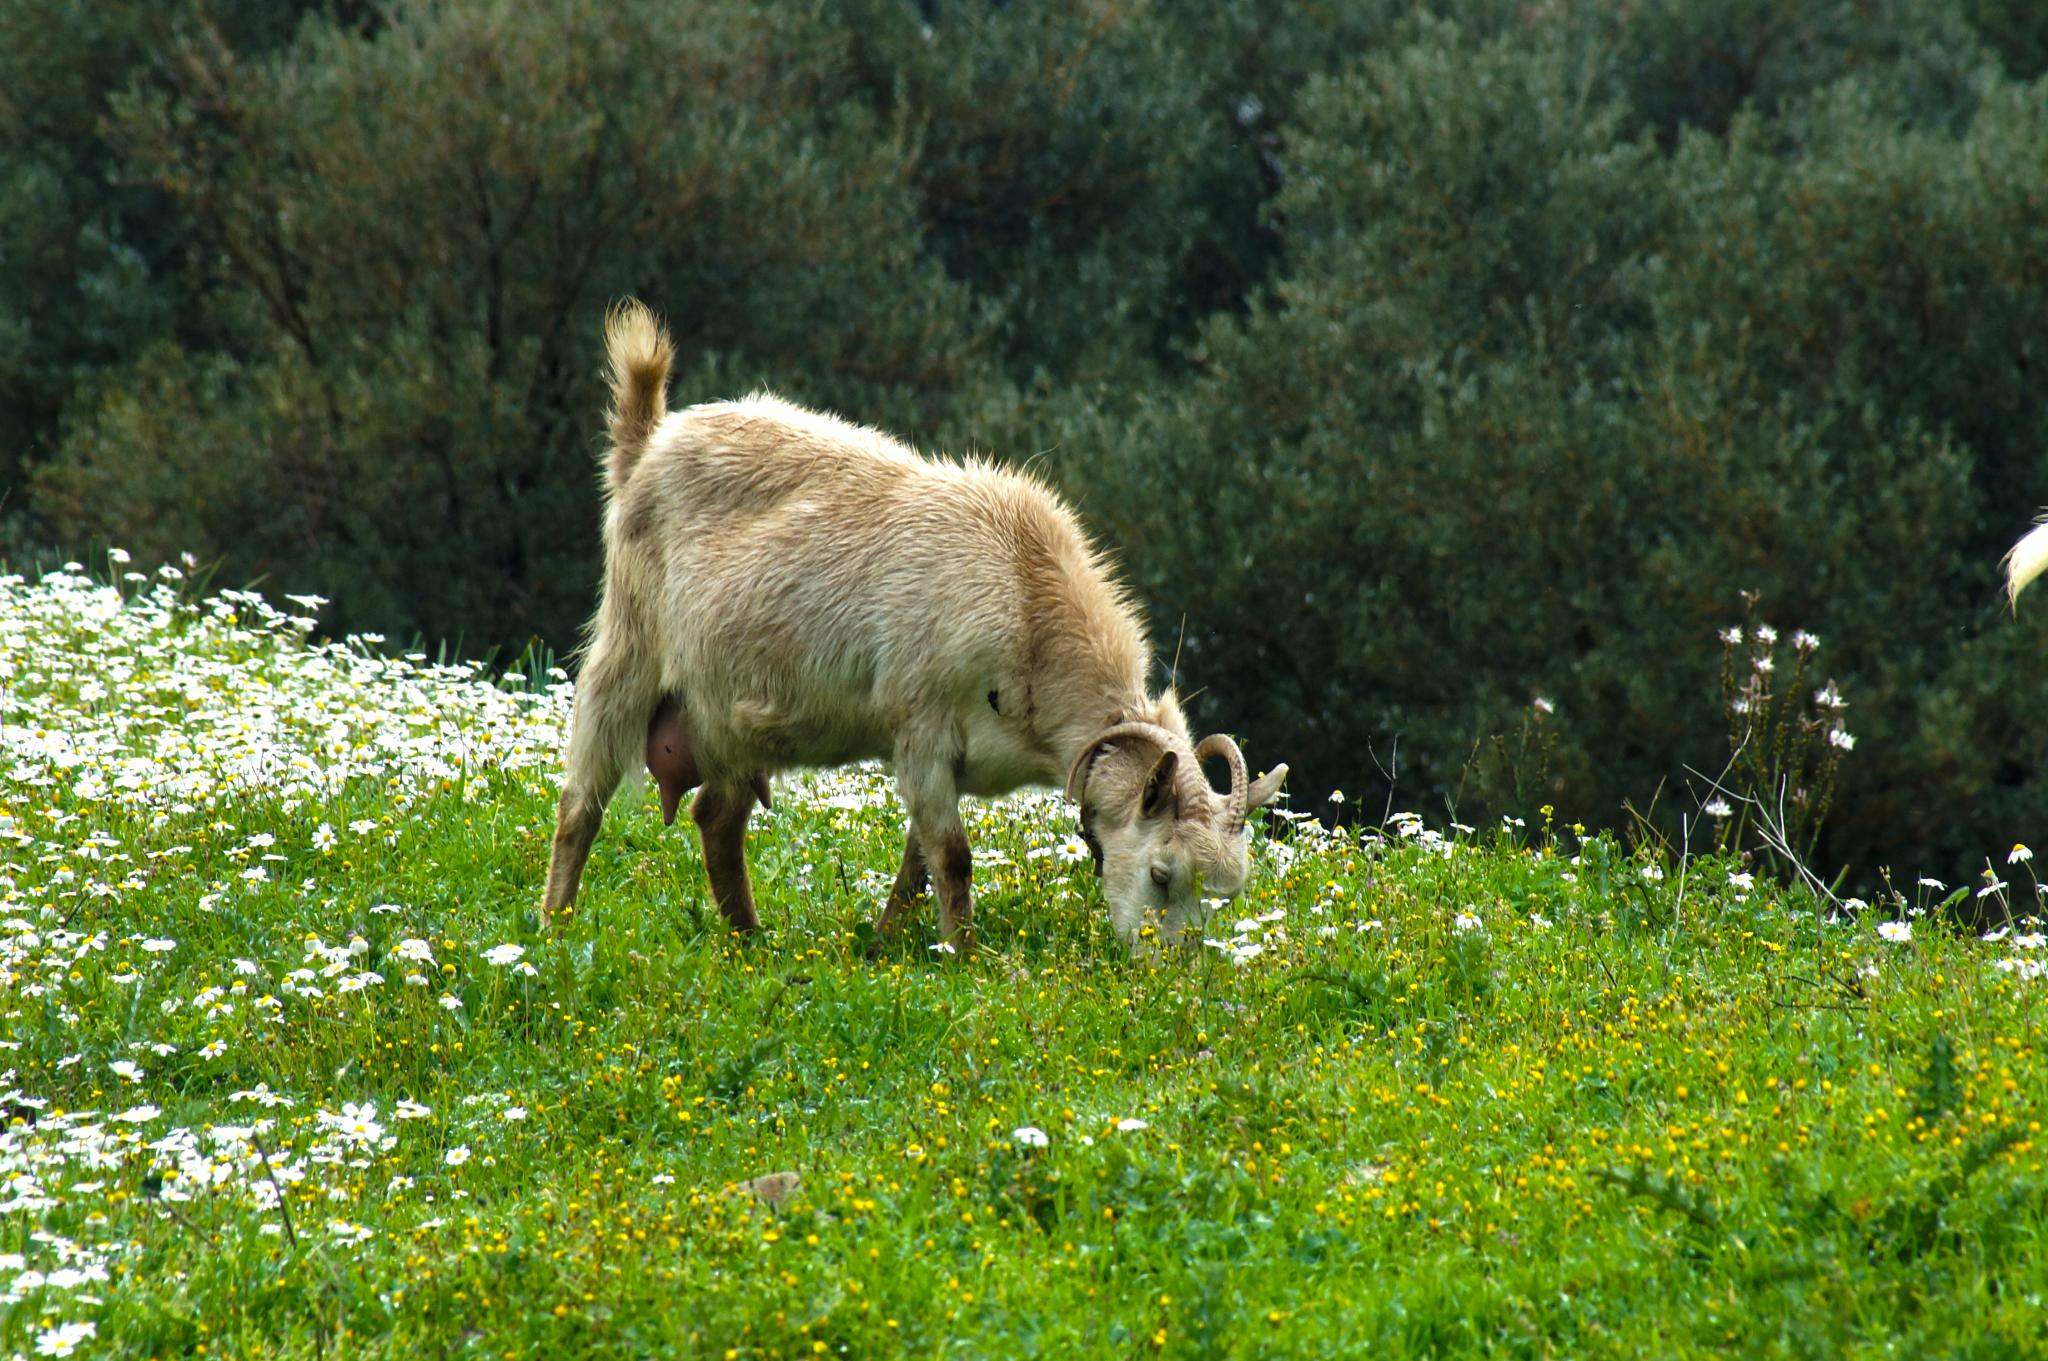 Goat milk by Blackhawk